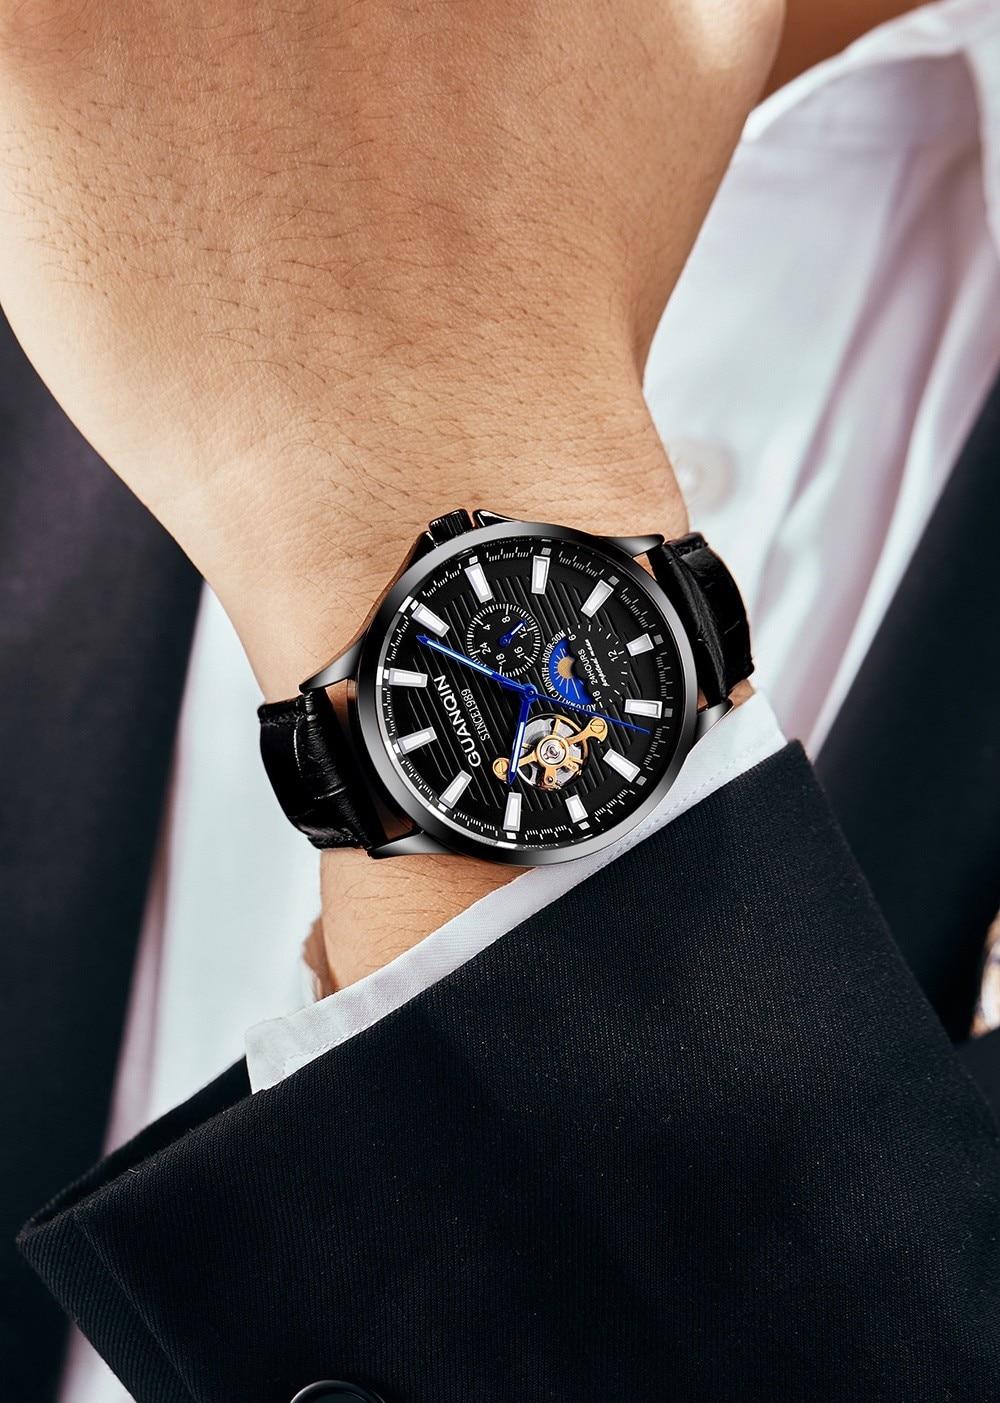 GUANQIN 2019 new watch men waterproof Automatic Luminous men watches top brand luxury skeleton clock men leather erkek kol saati